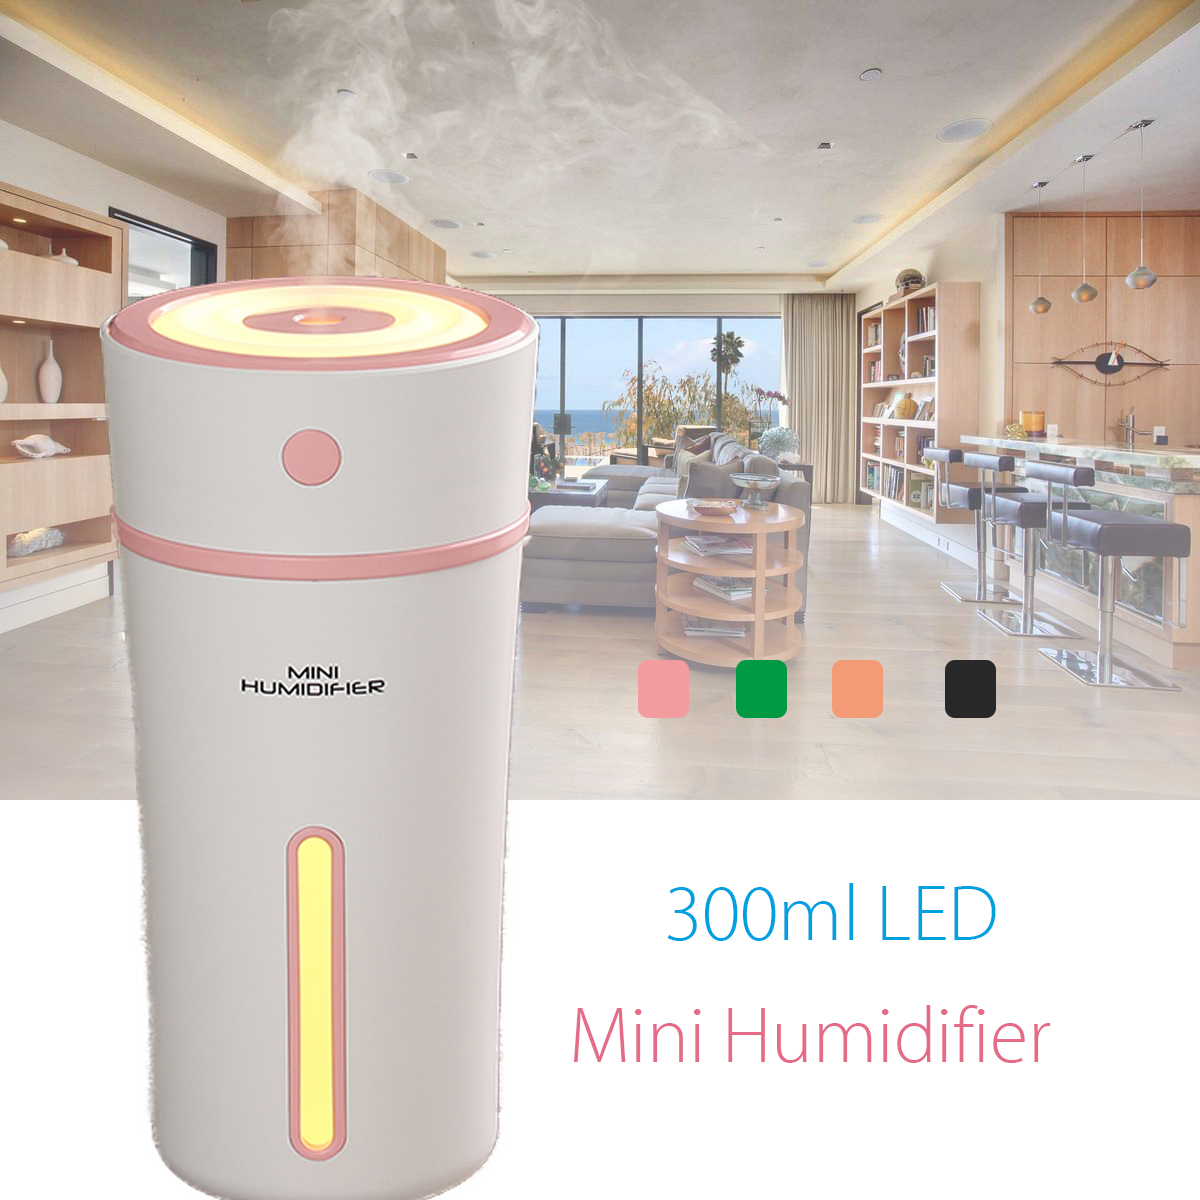 300ml Portable USB LED Ultrasonic Car Home Mini Humidifier Essential Oil Diffuser Mist Purifier